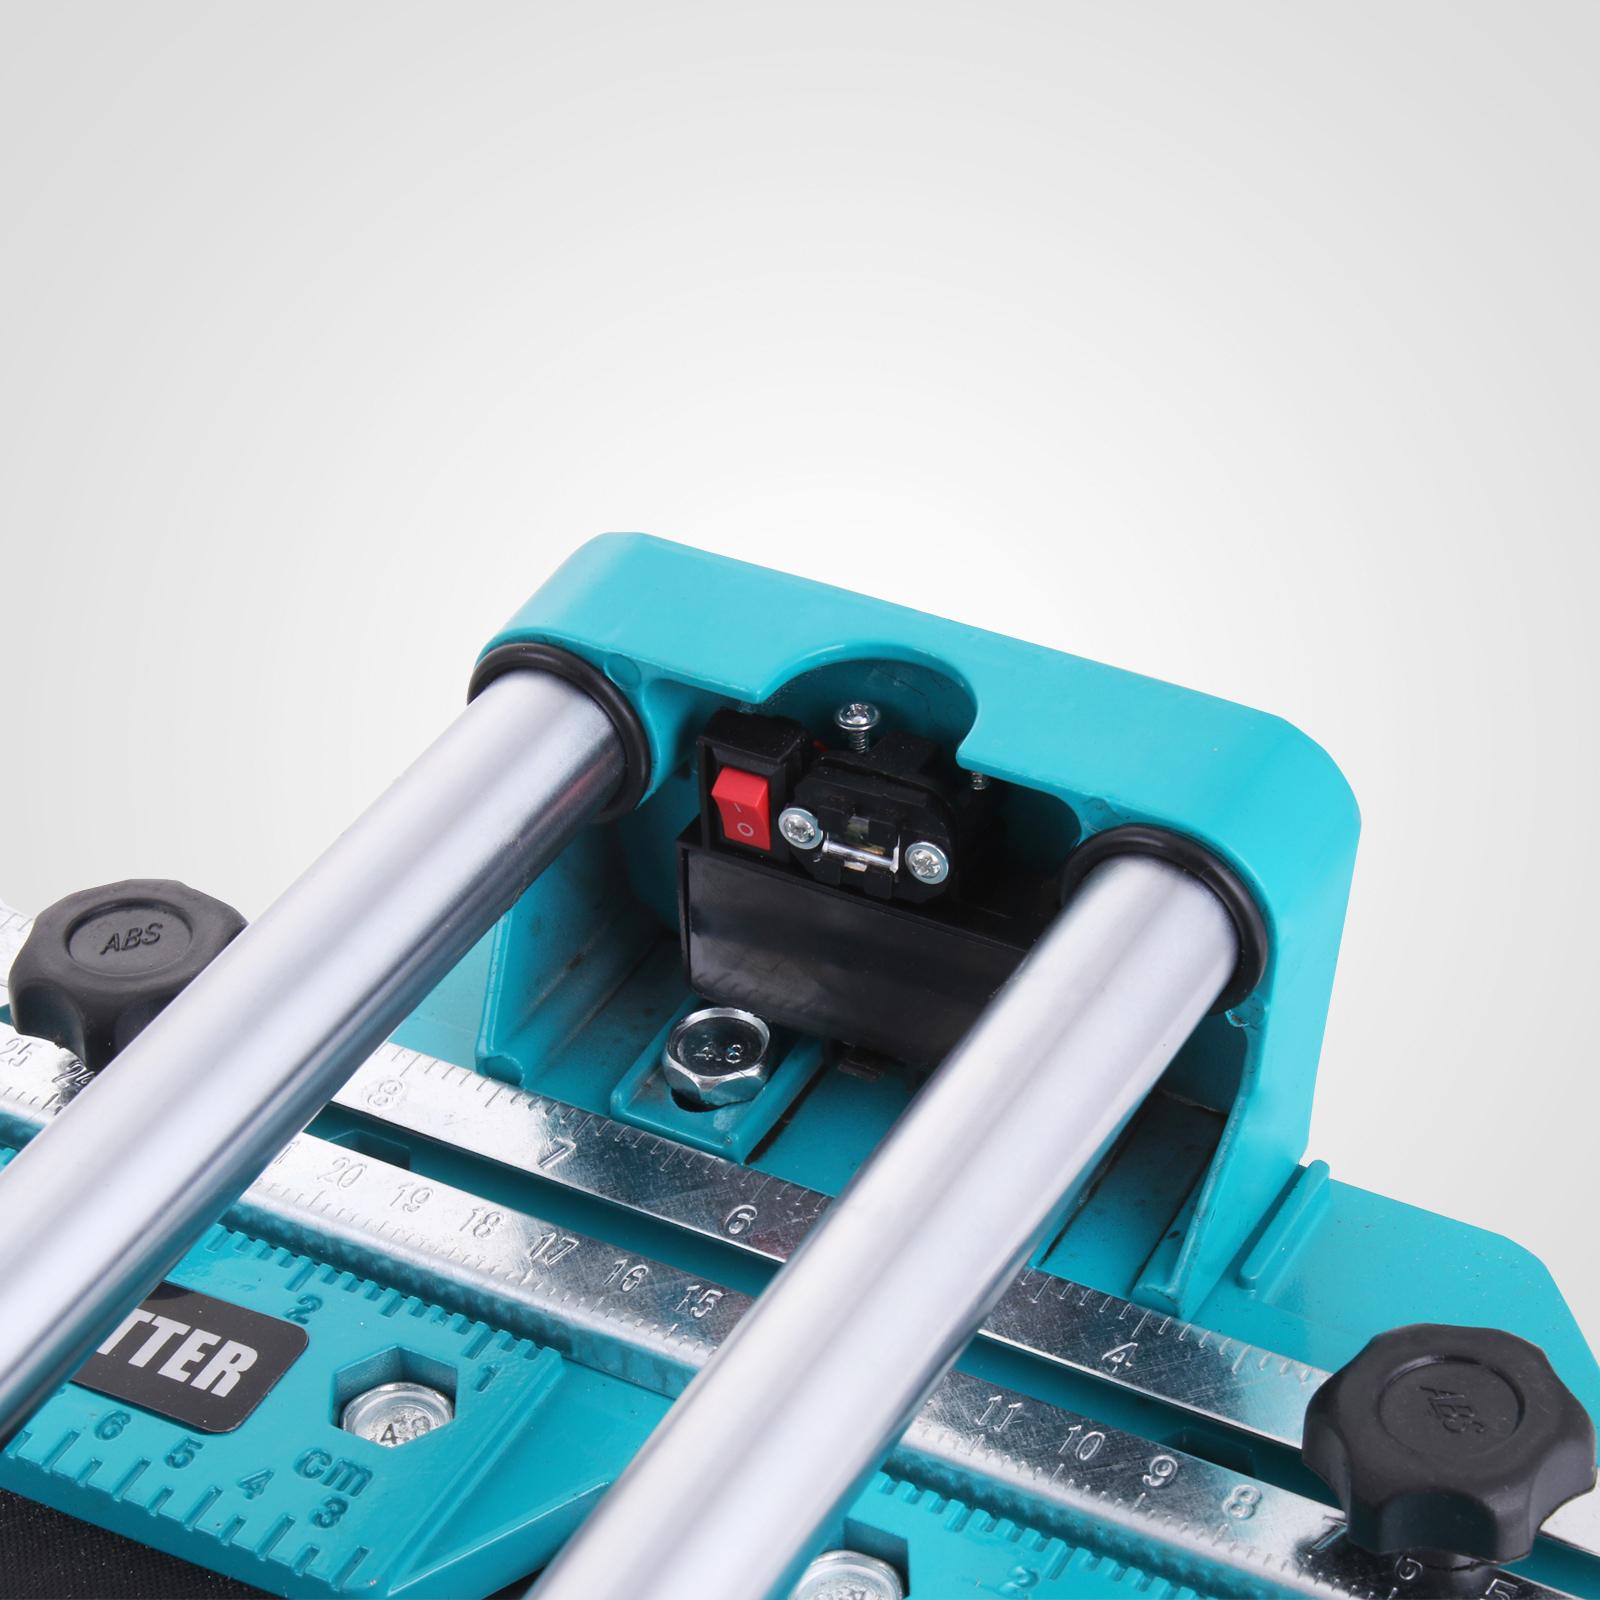 Tile-Cutter-40-034-48-039-039-Manual-Cutting-Machine-0-24-0-6-Thickness-Porcelain-Ceramic thumbnail 21